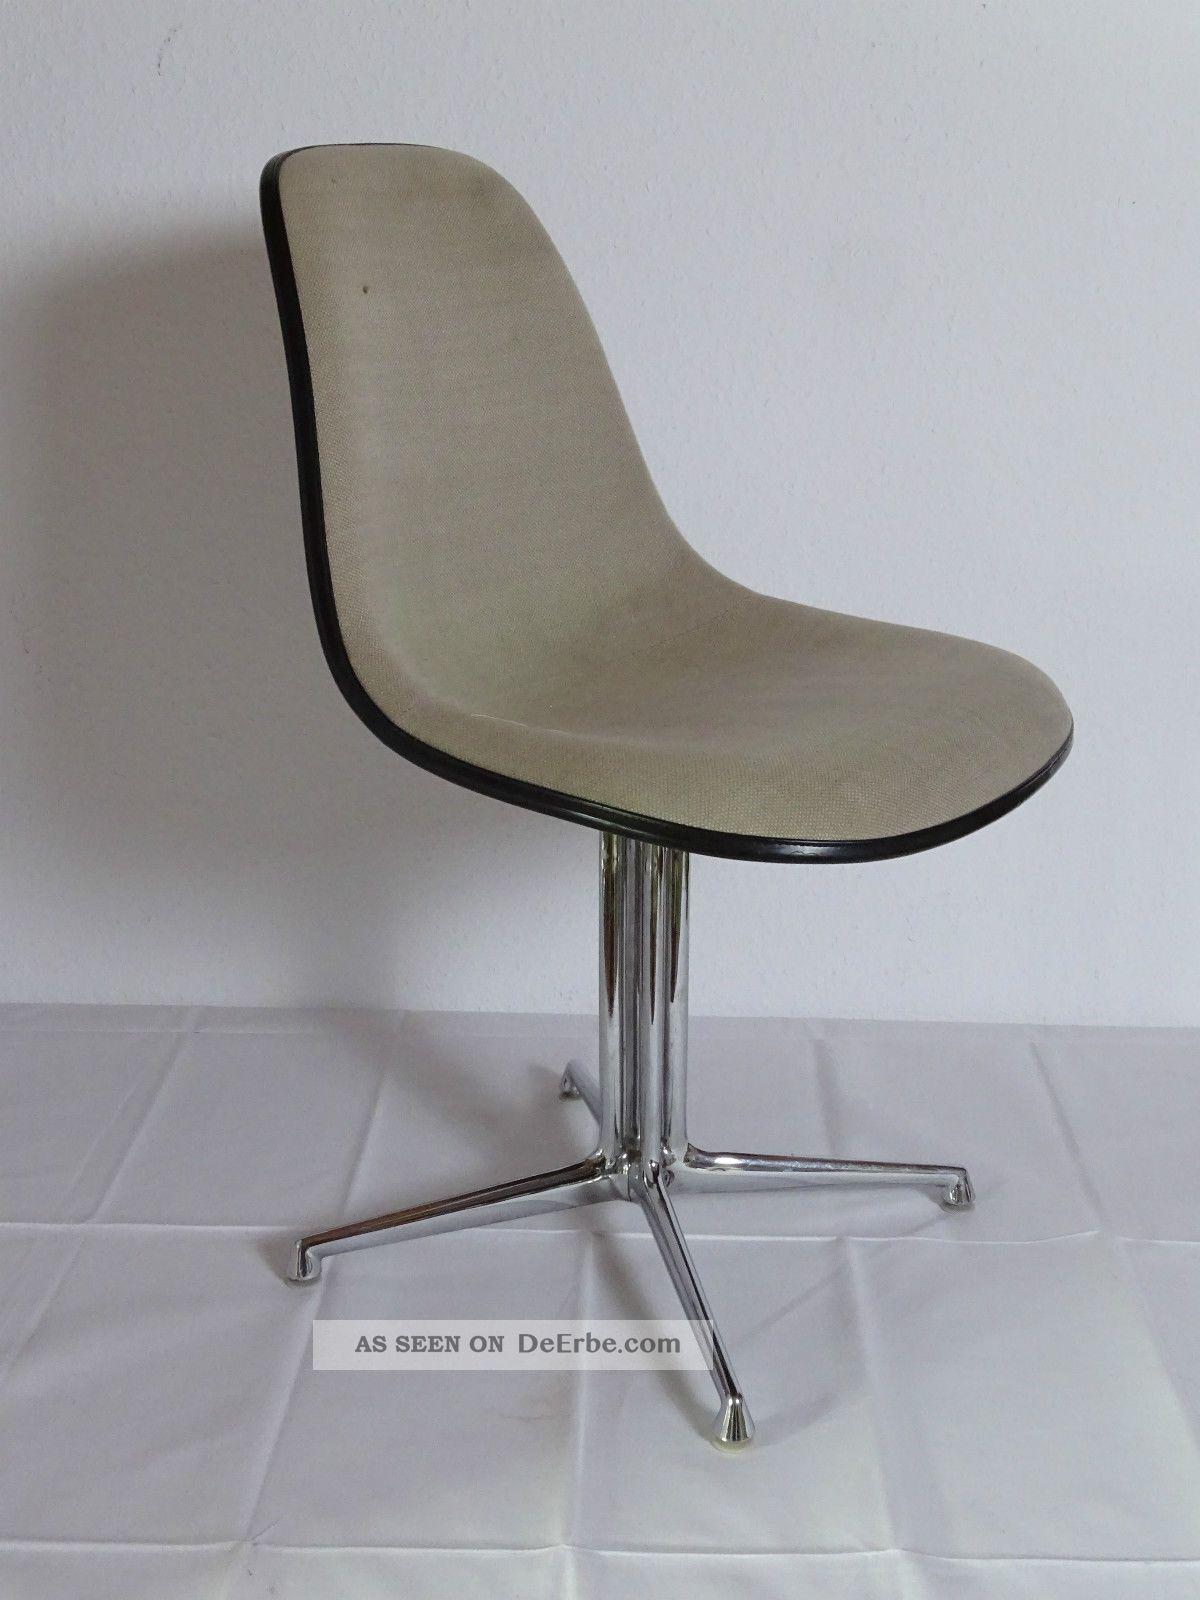 La Fonda Chair Herman Miller Vitra Charles - Ray Eames Gestell Base Verchromt 1960-1969 Bild